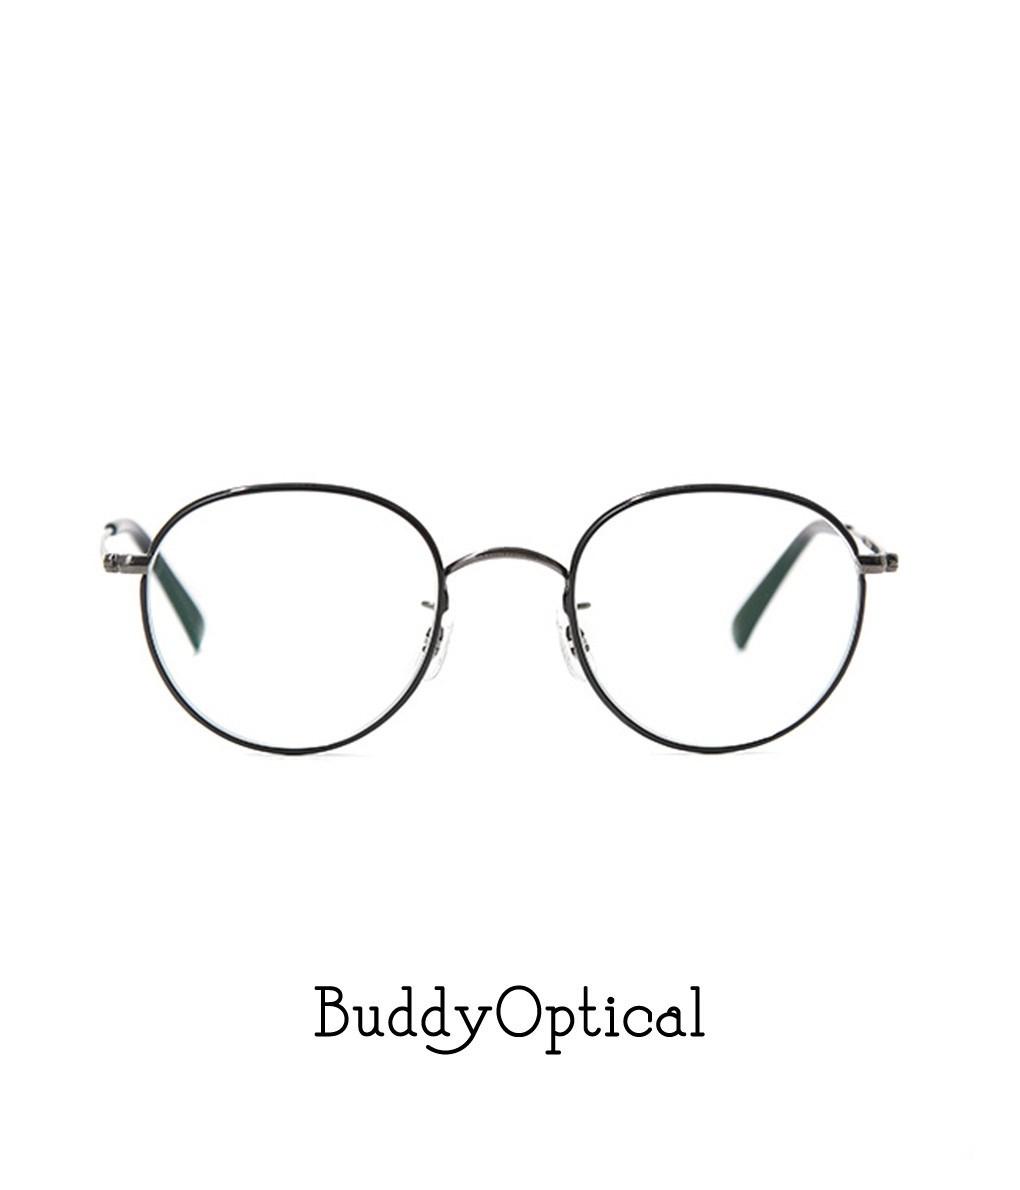 BuddyOptical / バディオプティカル : Princeton -titanium / 全2色 : プリンストン メガネ 眼鏡 アイウェアー メンズ レディース : BO-Princeton 【COR】